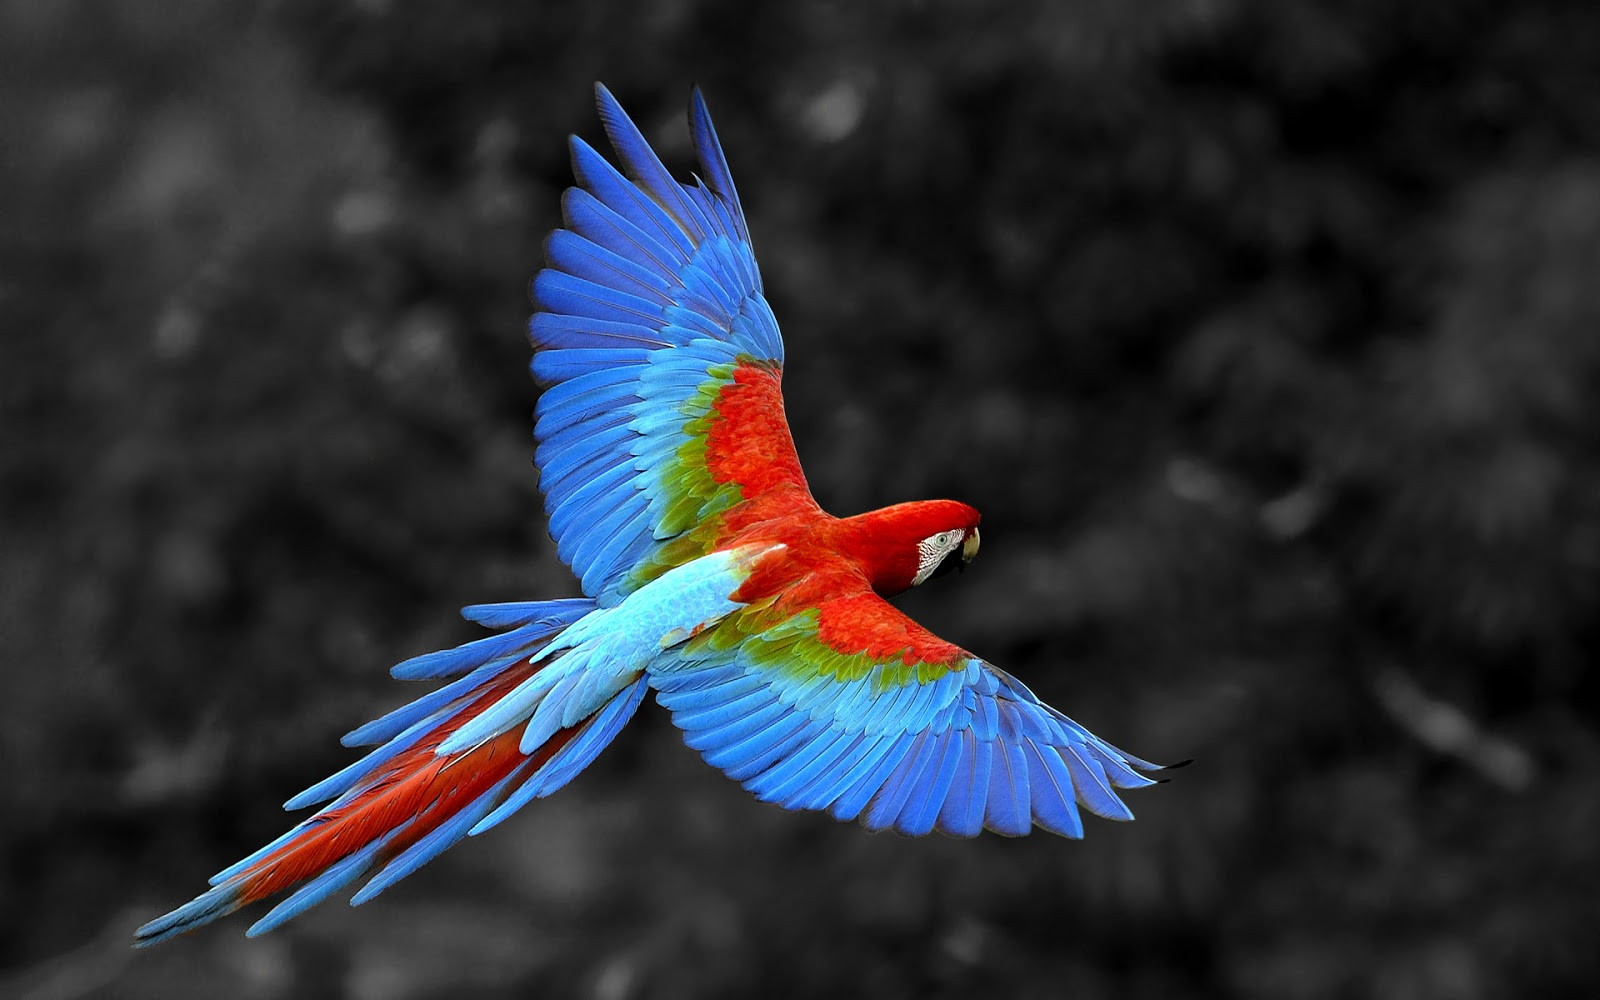 Alia Bhatt Cute Wallpaper Hd Wallpapers Fine Beautiful Parrot Colorful Parrot